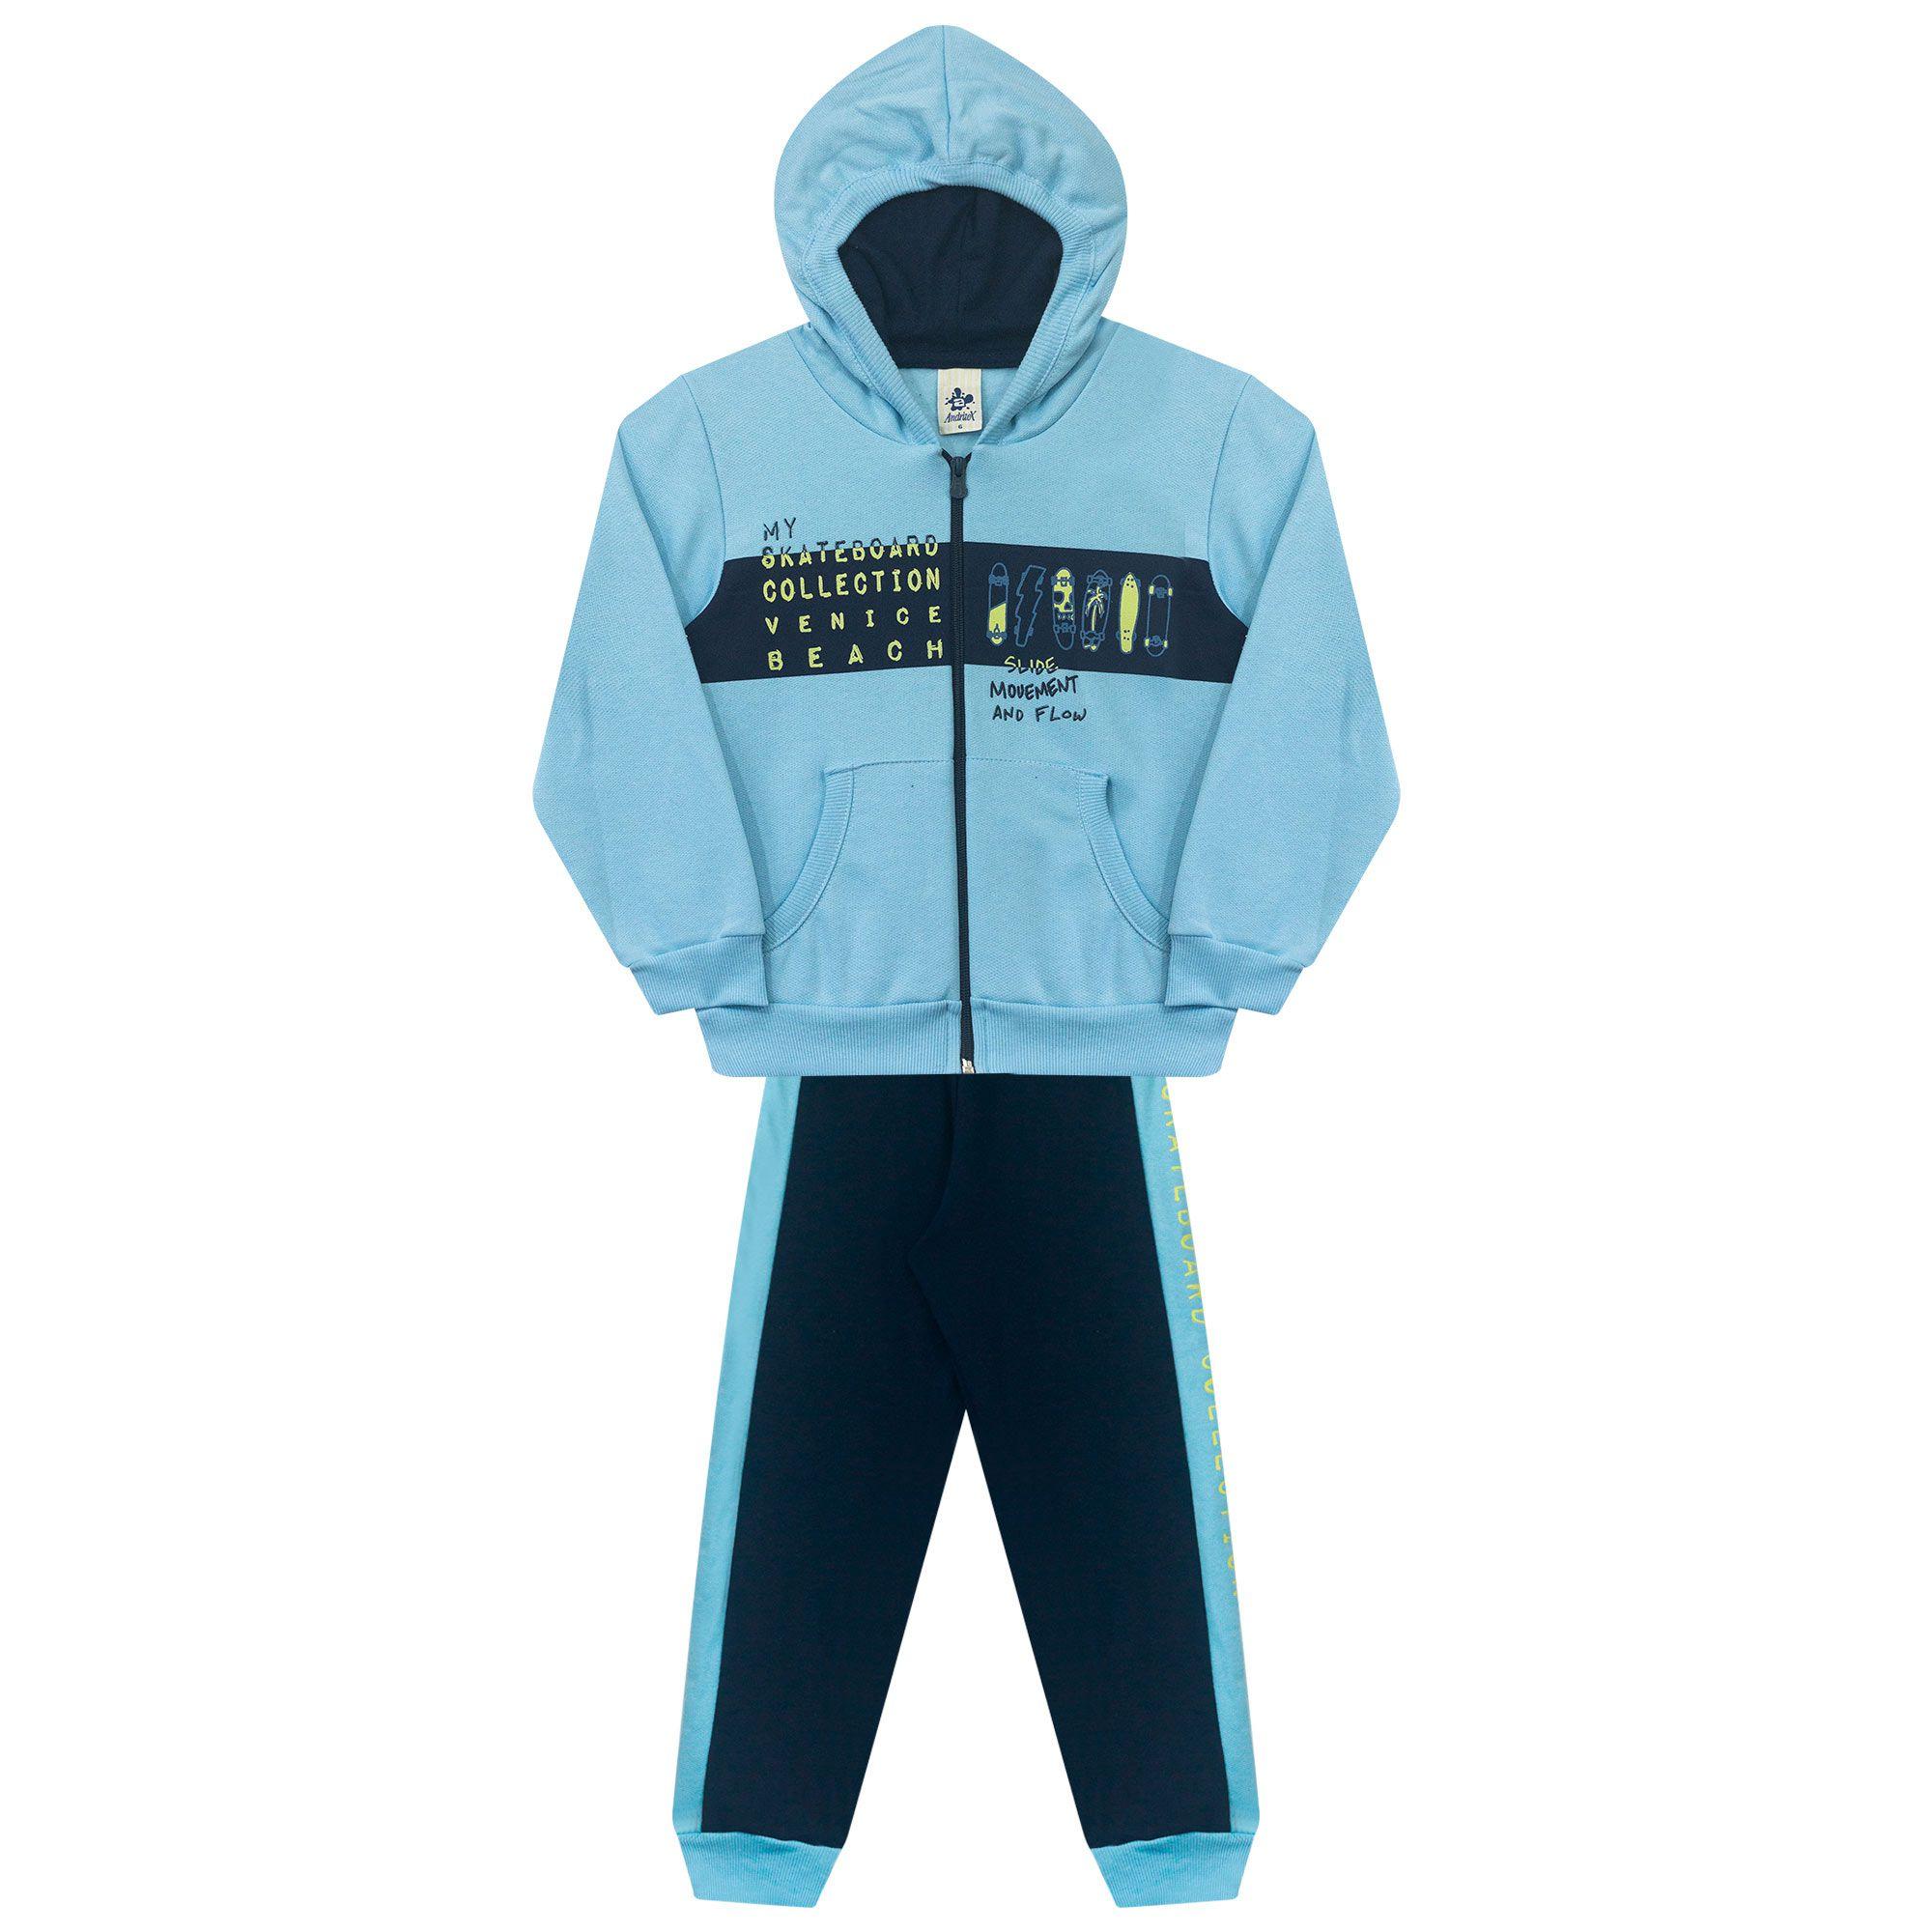 Conjunto Infantil Masculino  - Ref 5020 - Céu Azul/Marinho